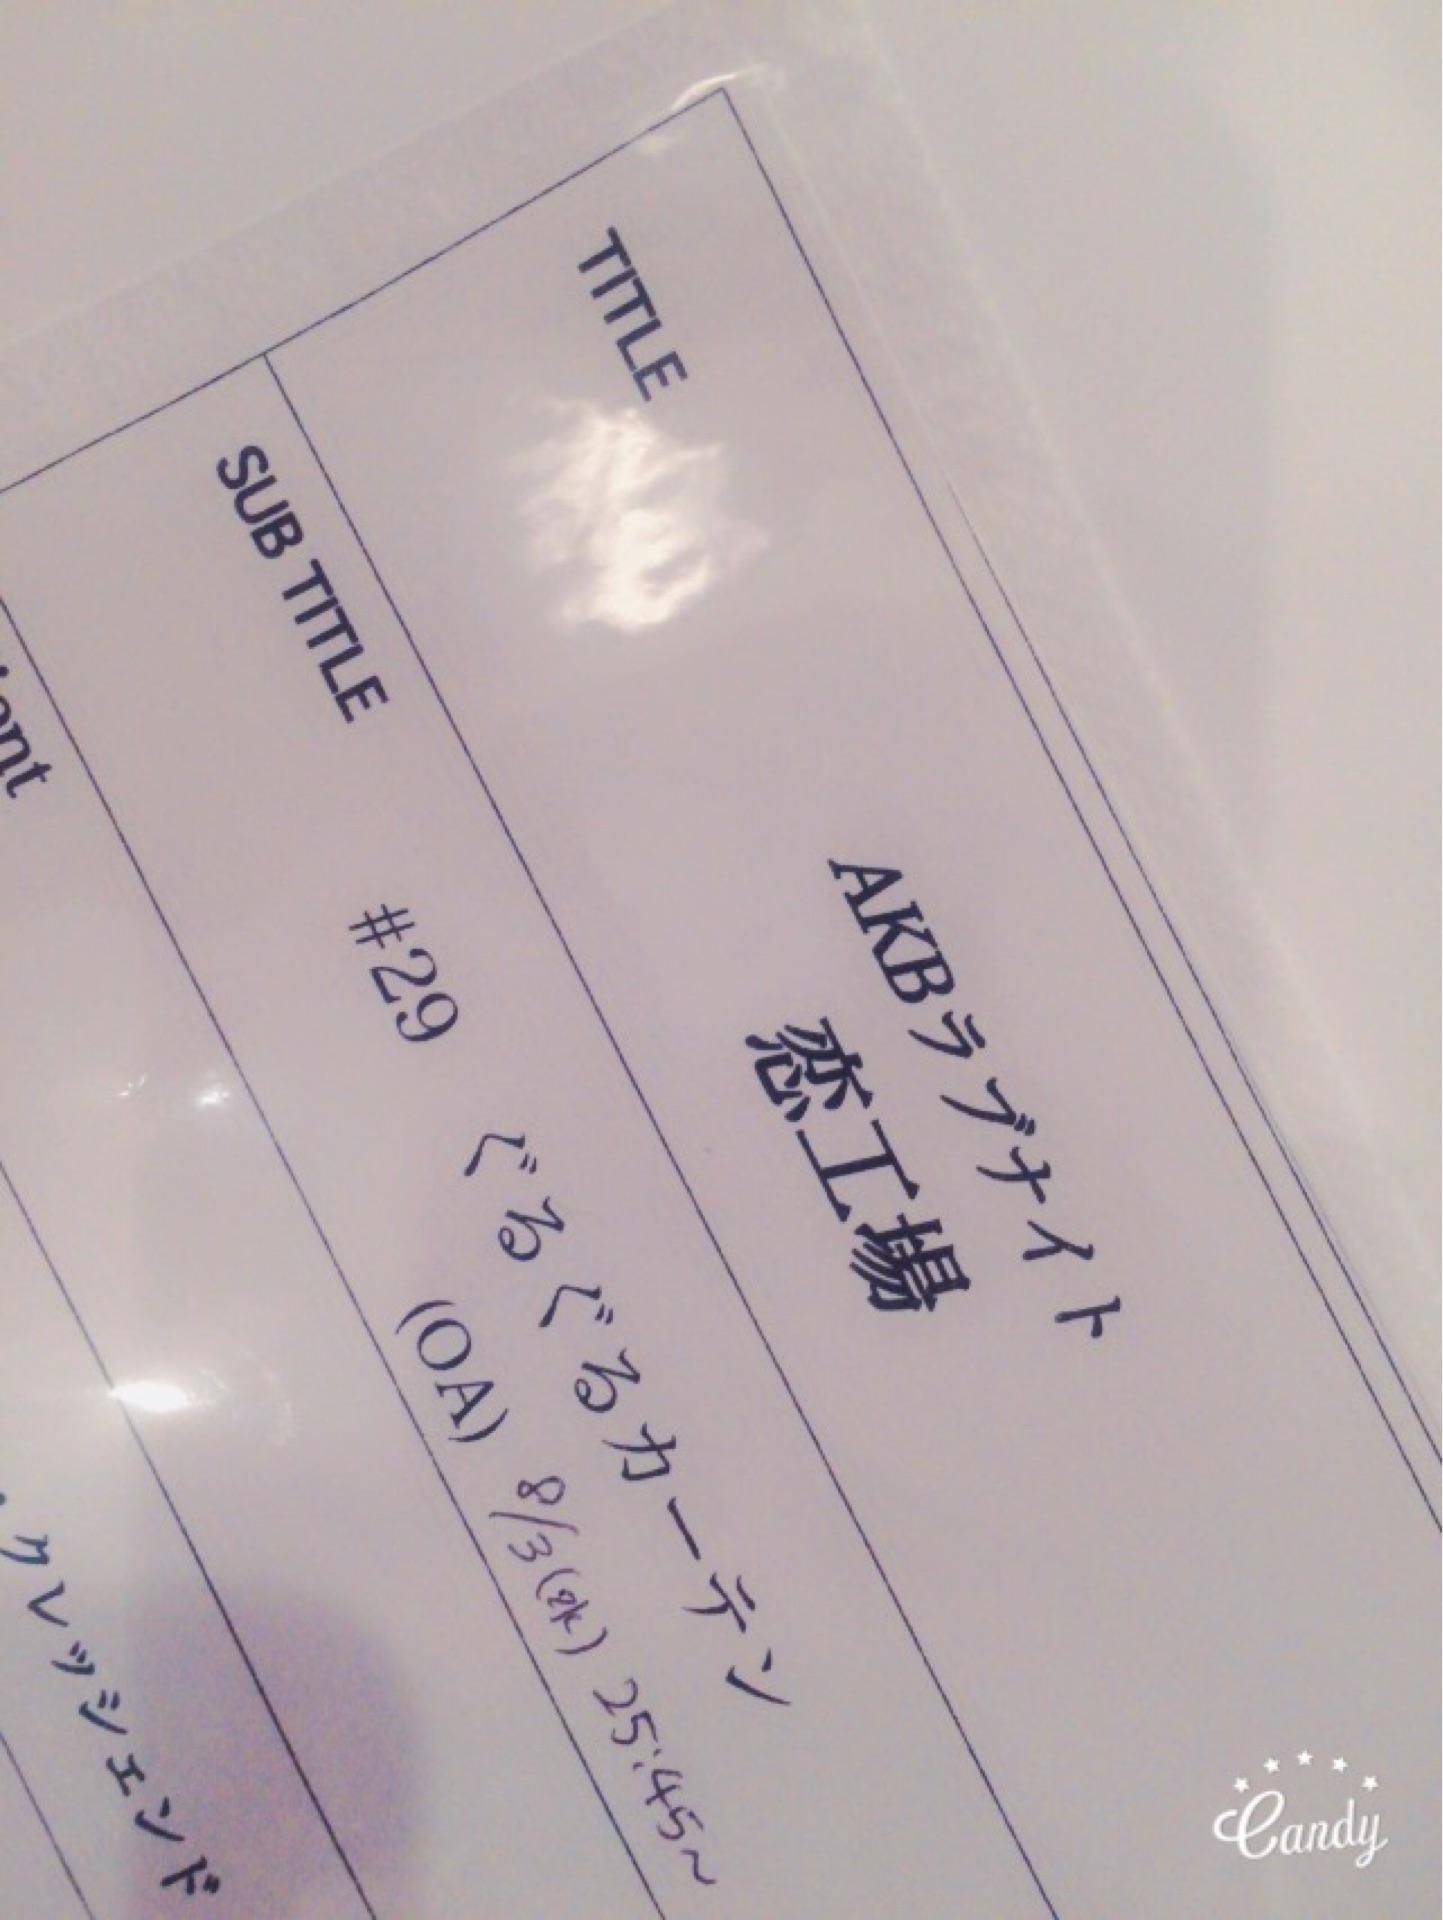 【HKT/AKB】宮脇咲良応援スレ☆135【さくらたん】 [転載禁止]©2ch.netYouTube動画>109本 ->画像>1808枚